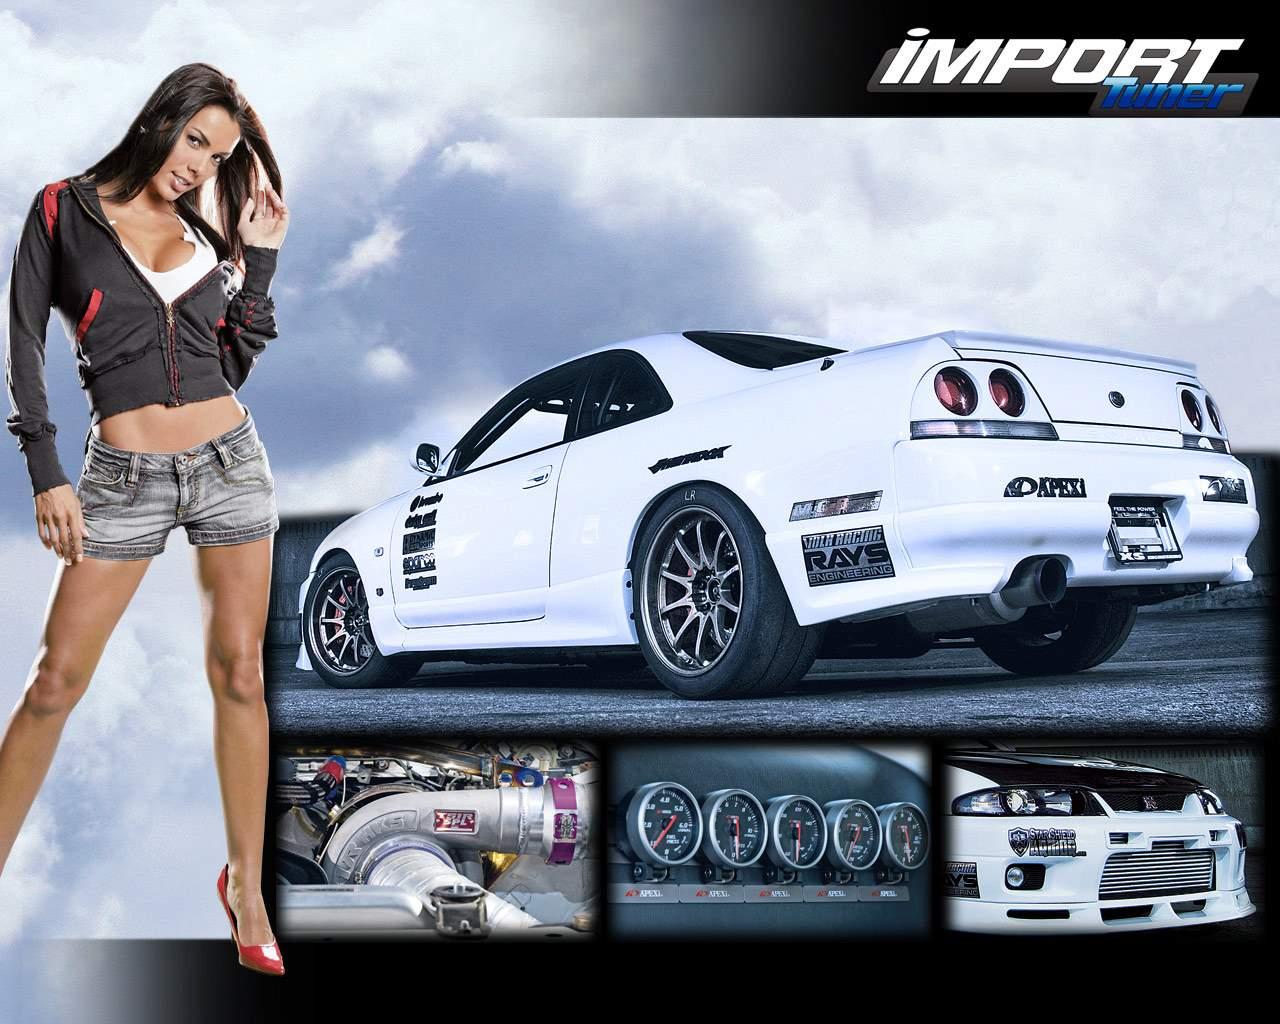 http://4.bp.blogspot.com/-4BWphgPyZbk/Tg0DtthHoTI/AAAAAAAAAHM/EfIcaVevBj0/s1600/Nissan_Skyline_GTR%252C_Import_Tuner_2006.jpg